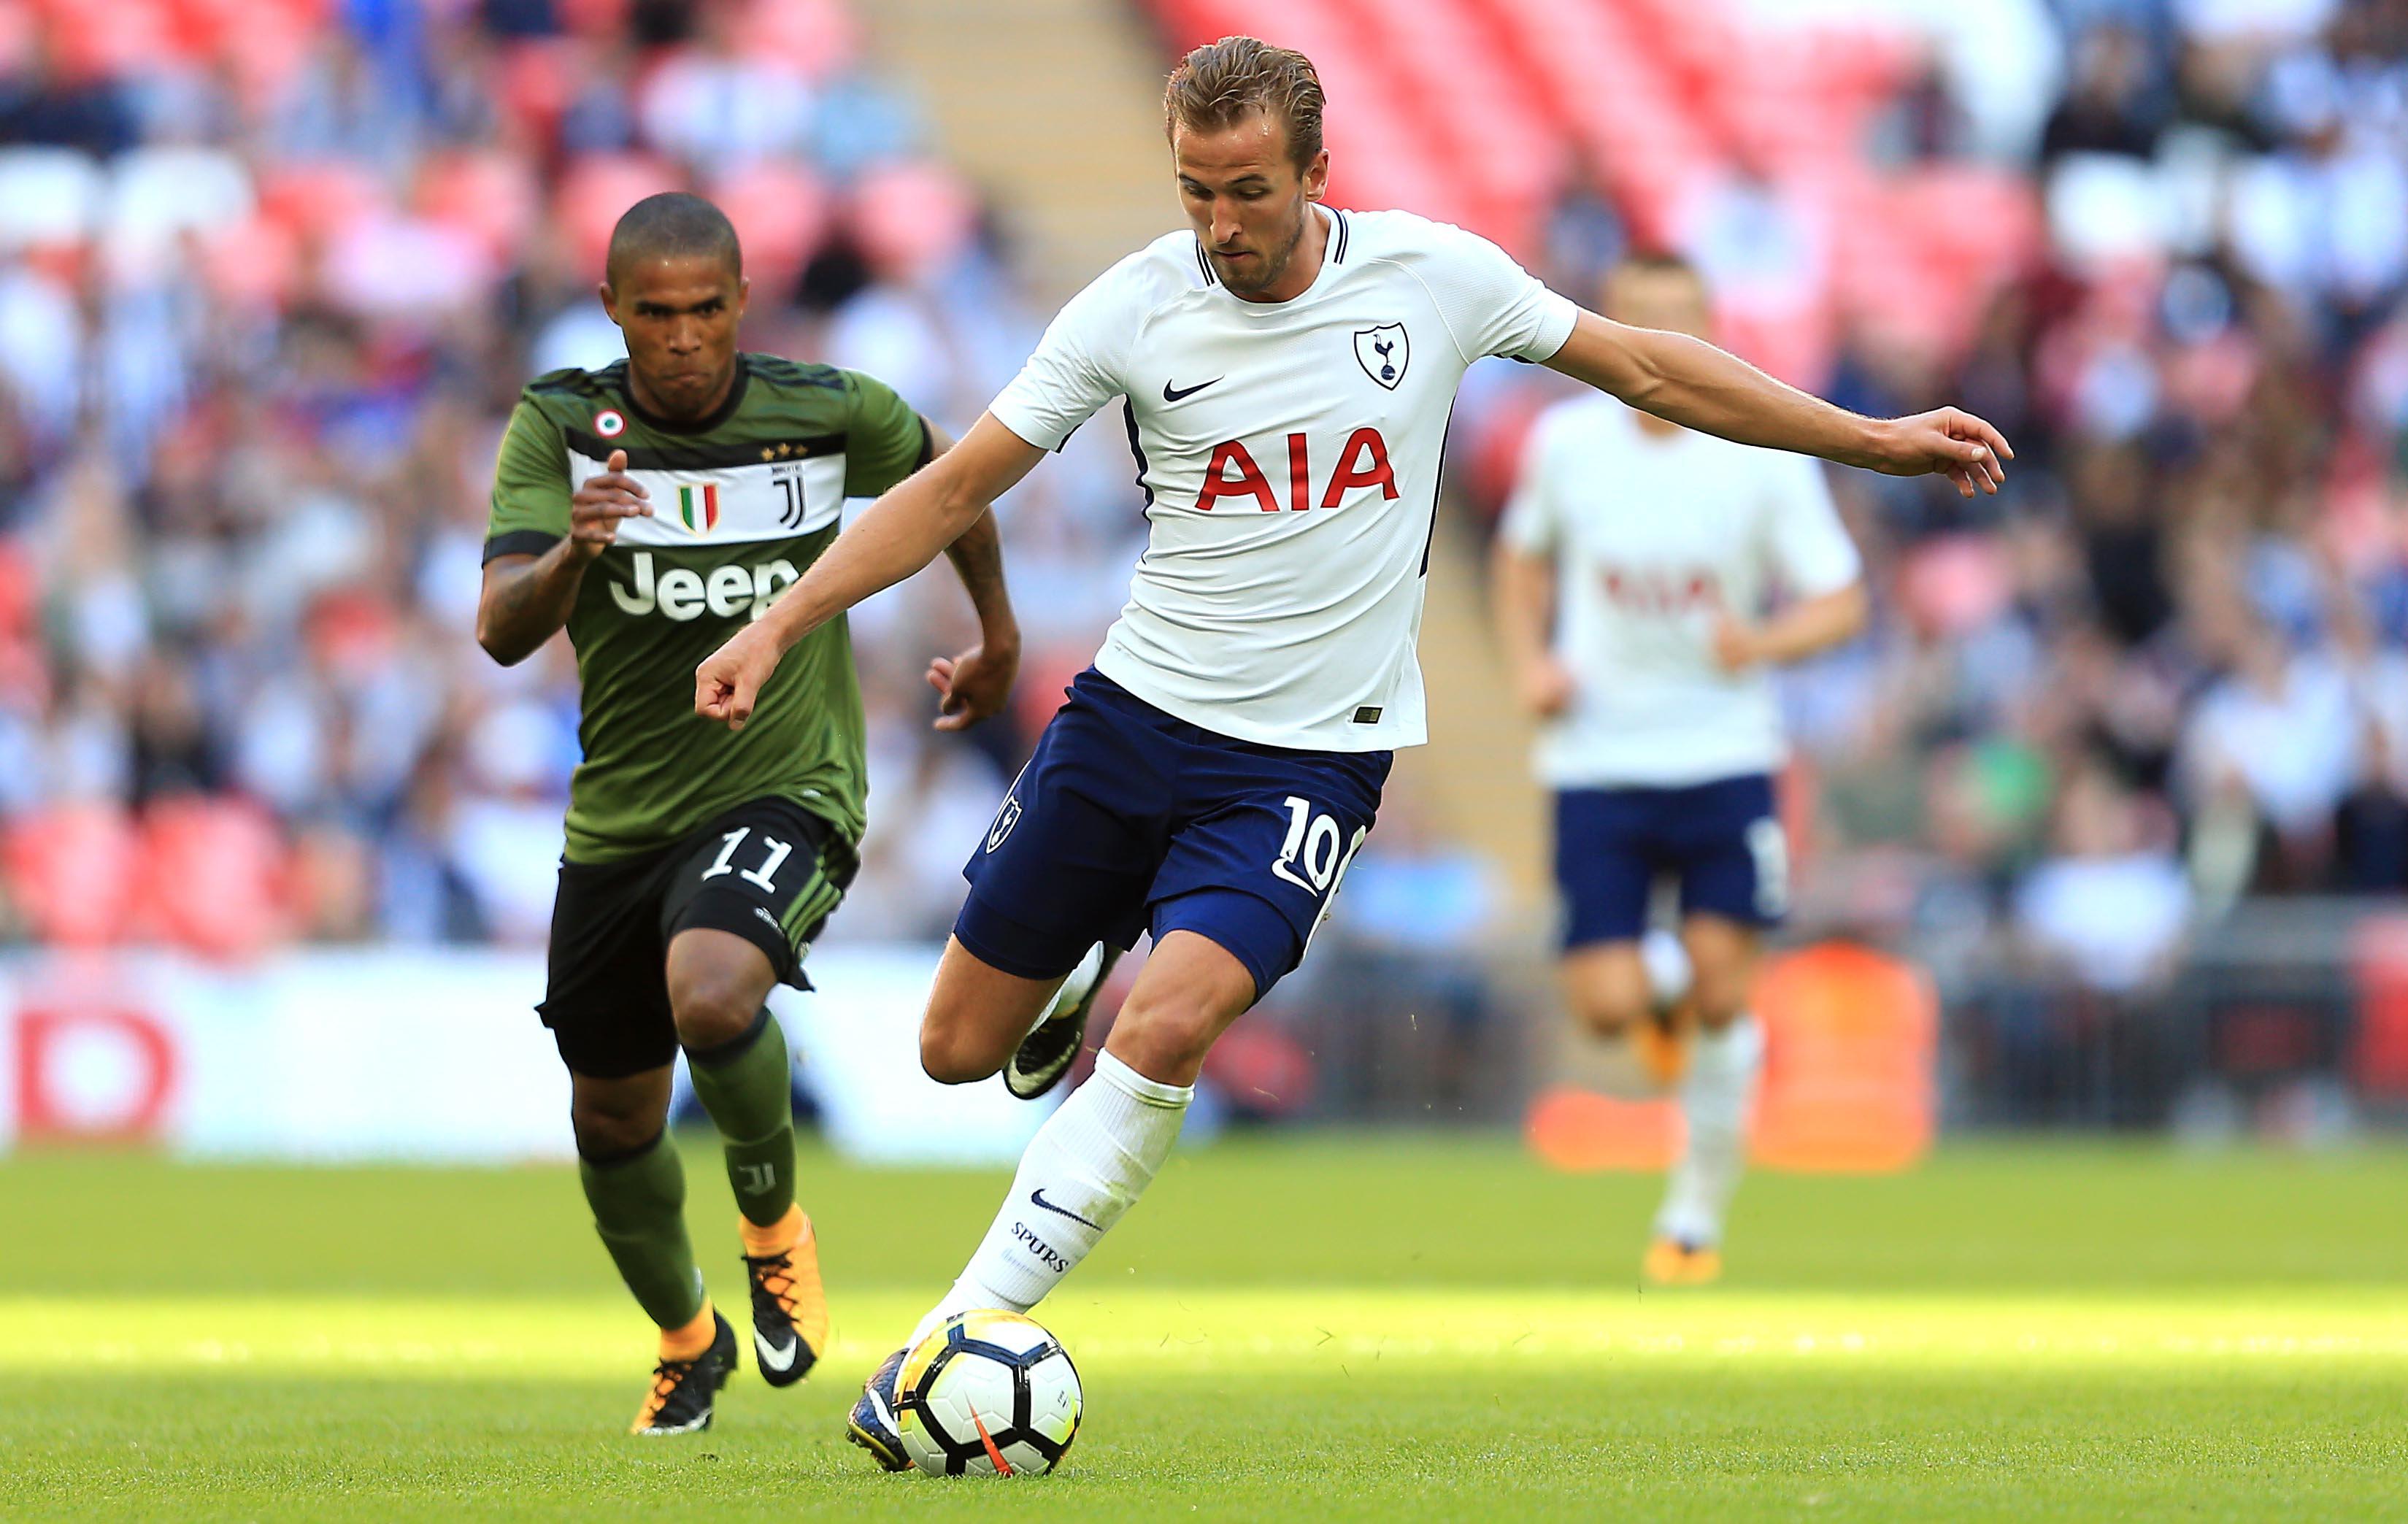 Tottenham Hotspur v Juventus - Pre-Season Friendly